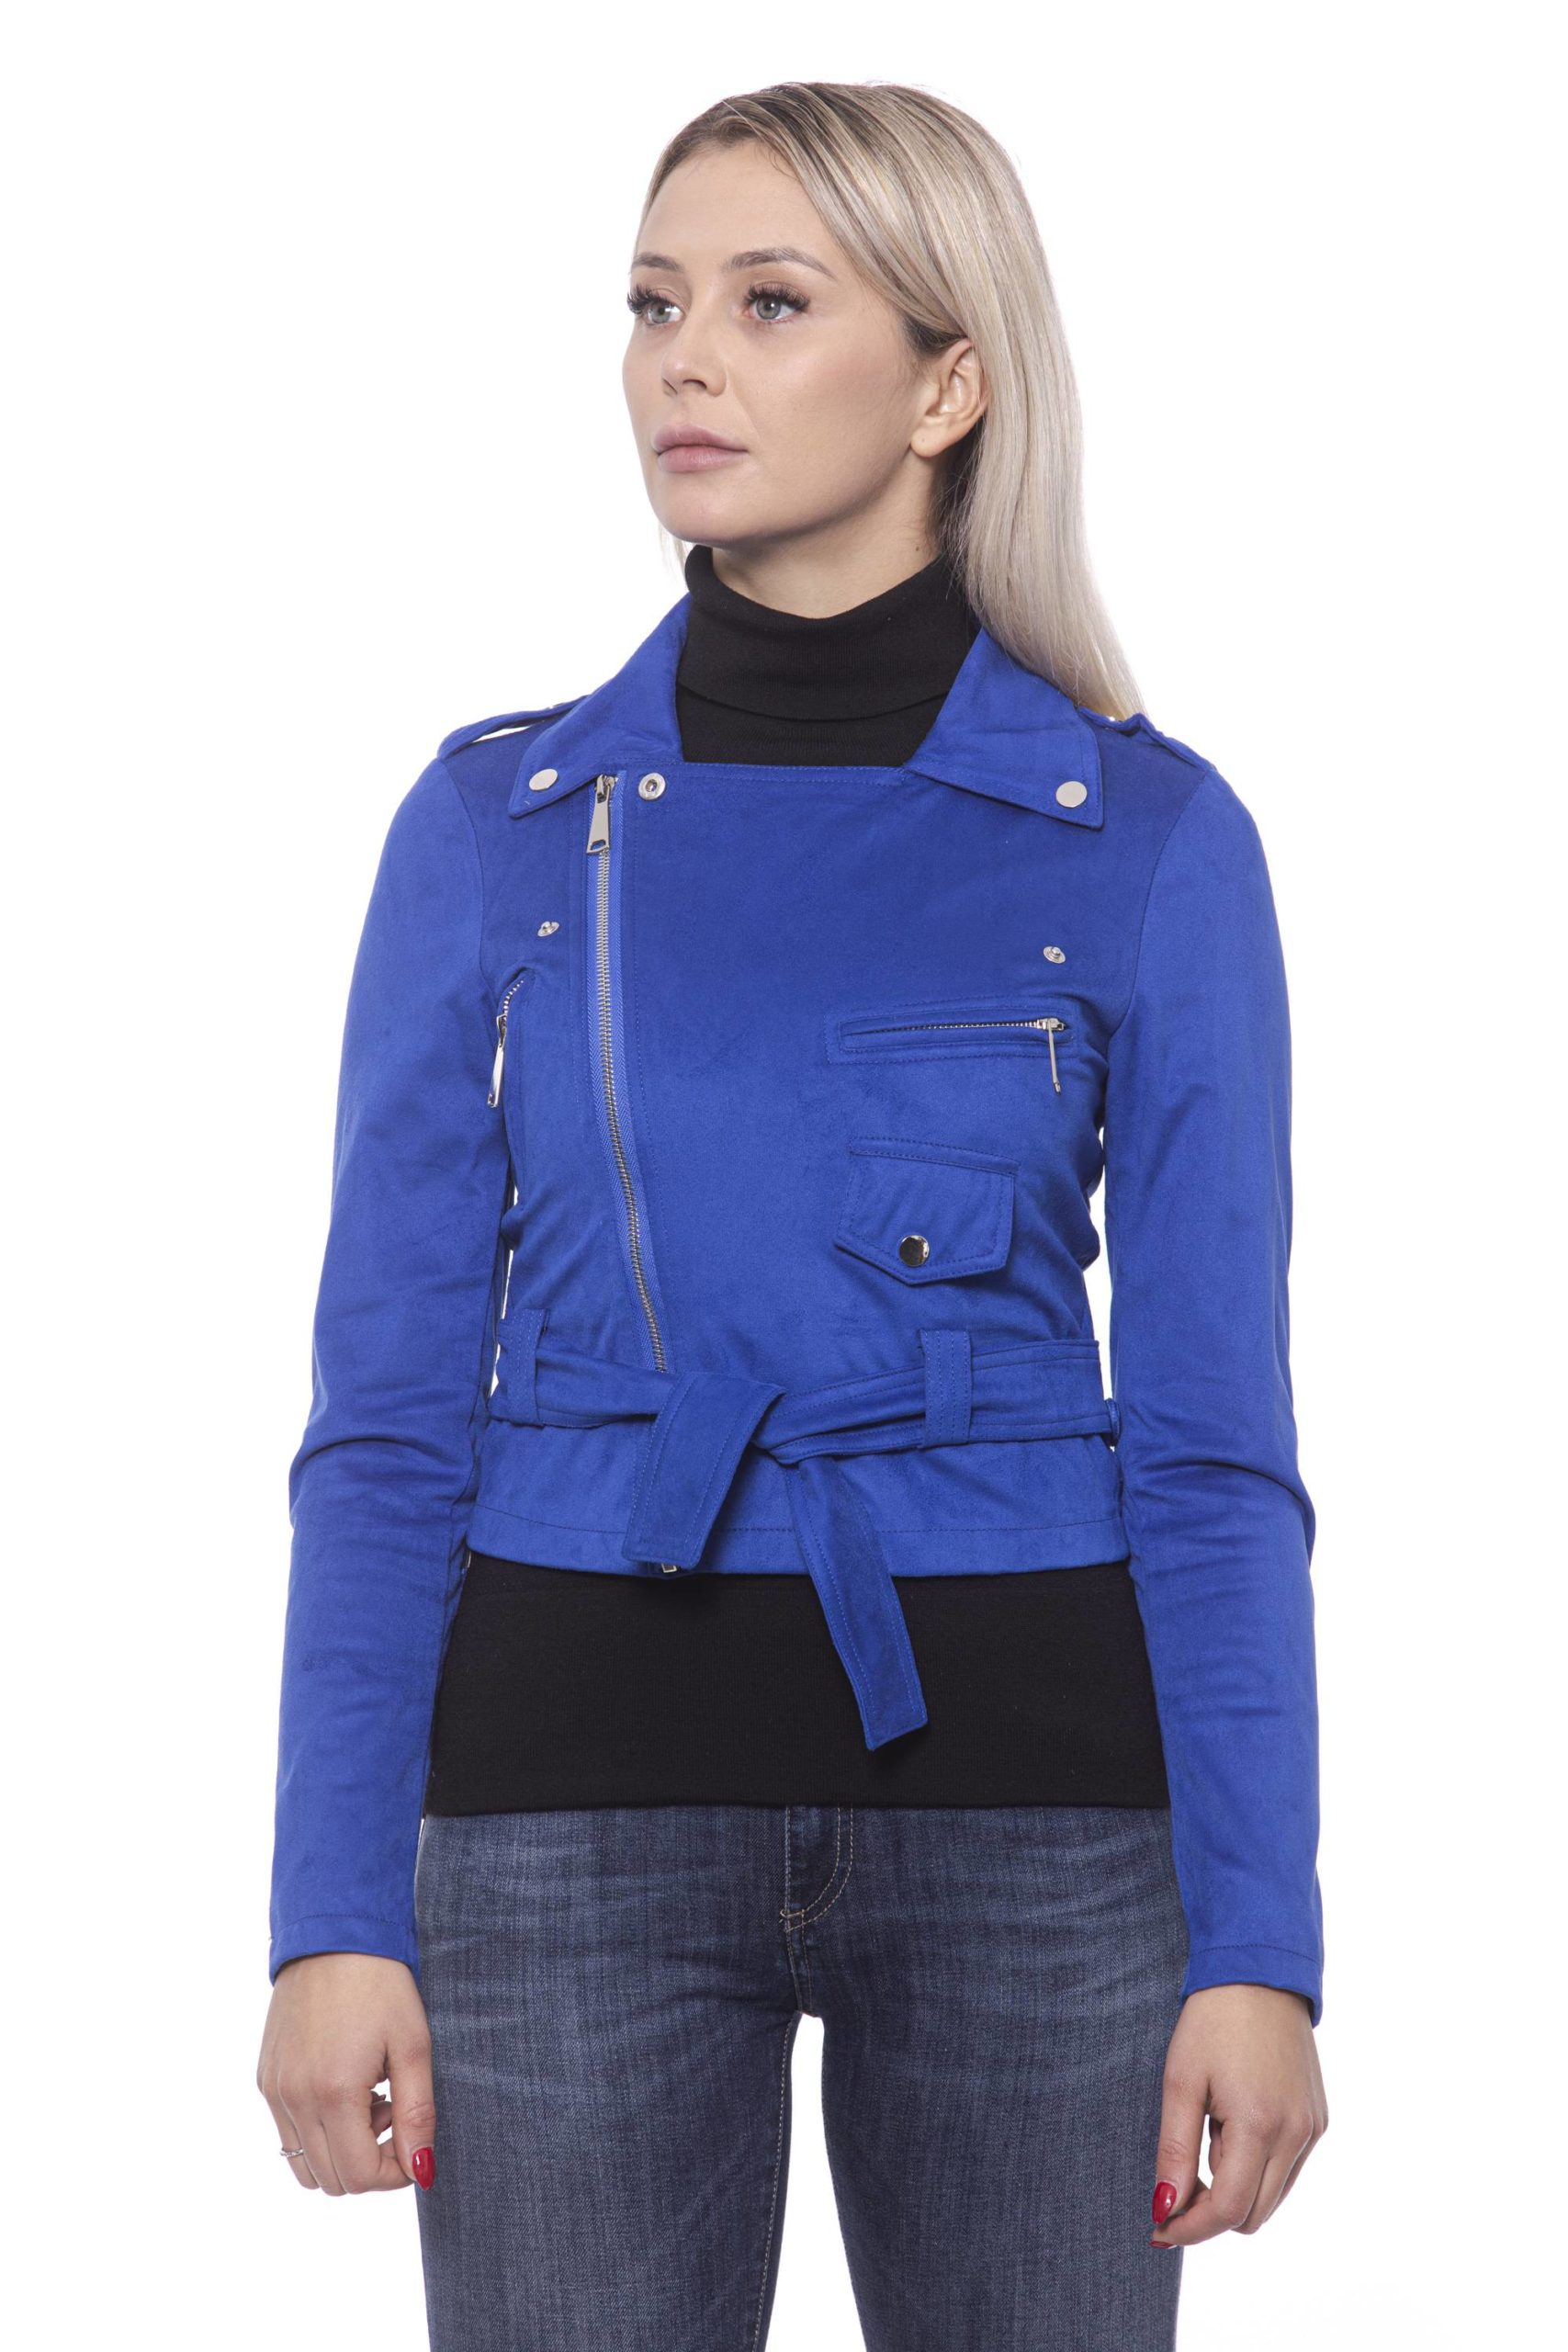 19V69 Italia Women's Jacket Blue 191388434 - IT42 | S